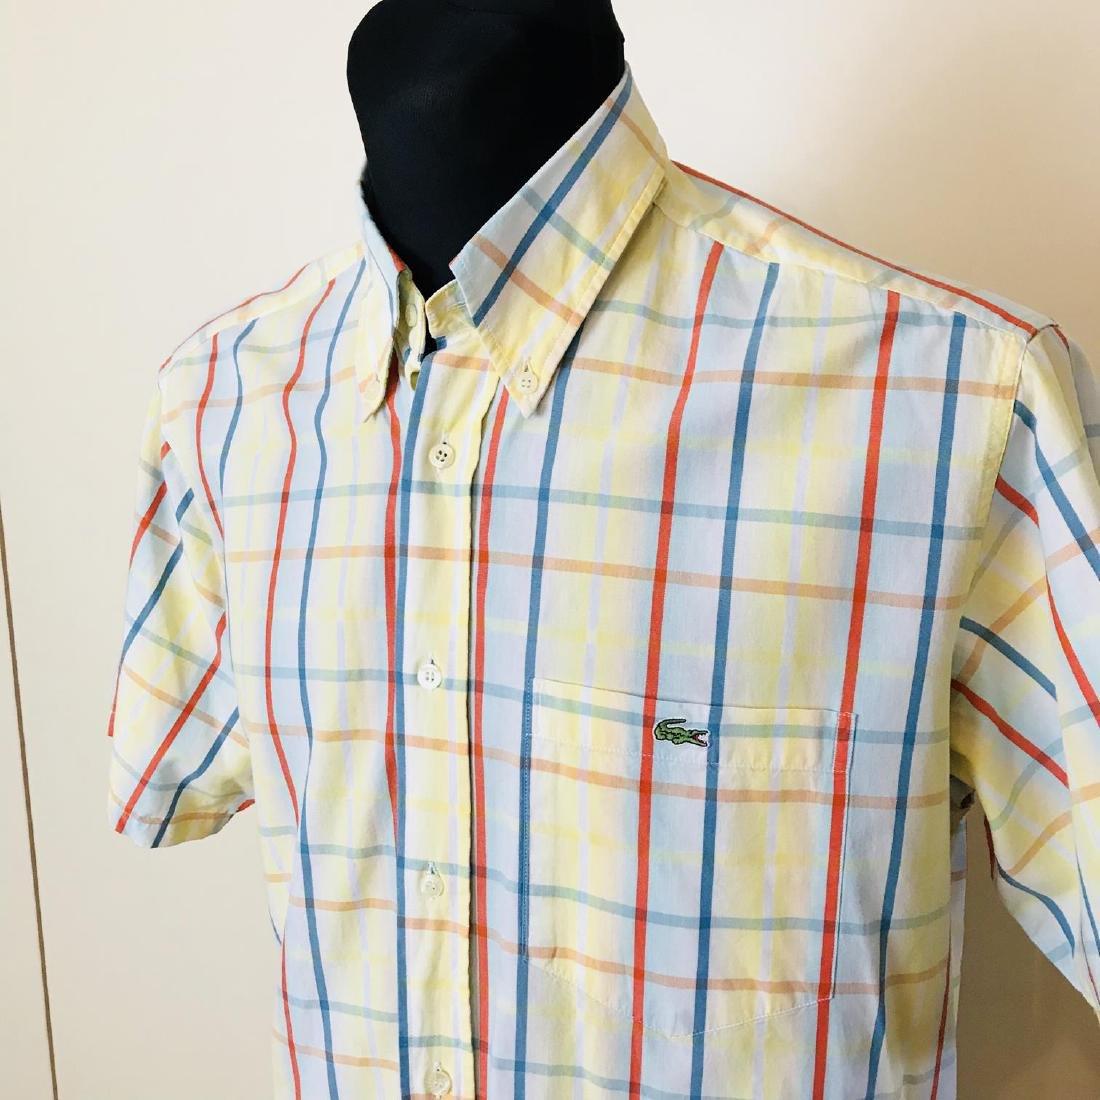 Men's Lacoste Short Sleeve Shirt Top Size US 41 Large - 2